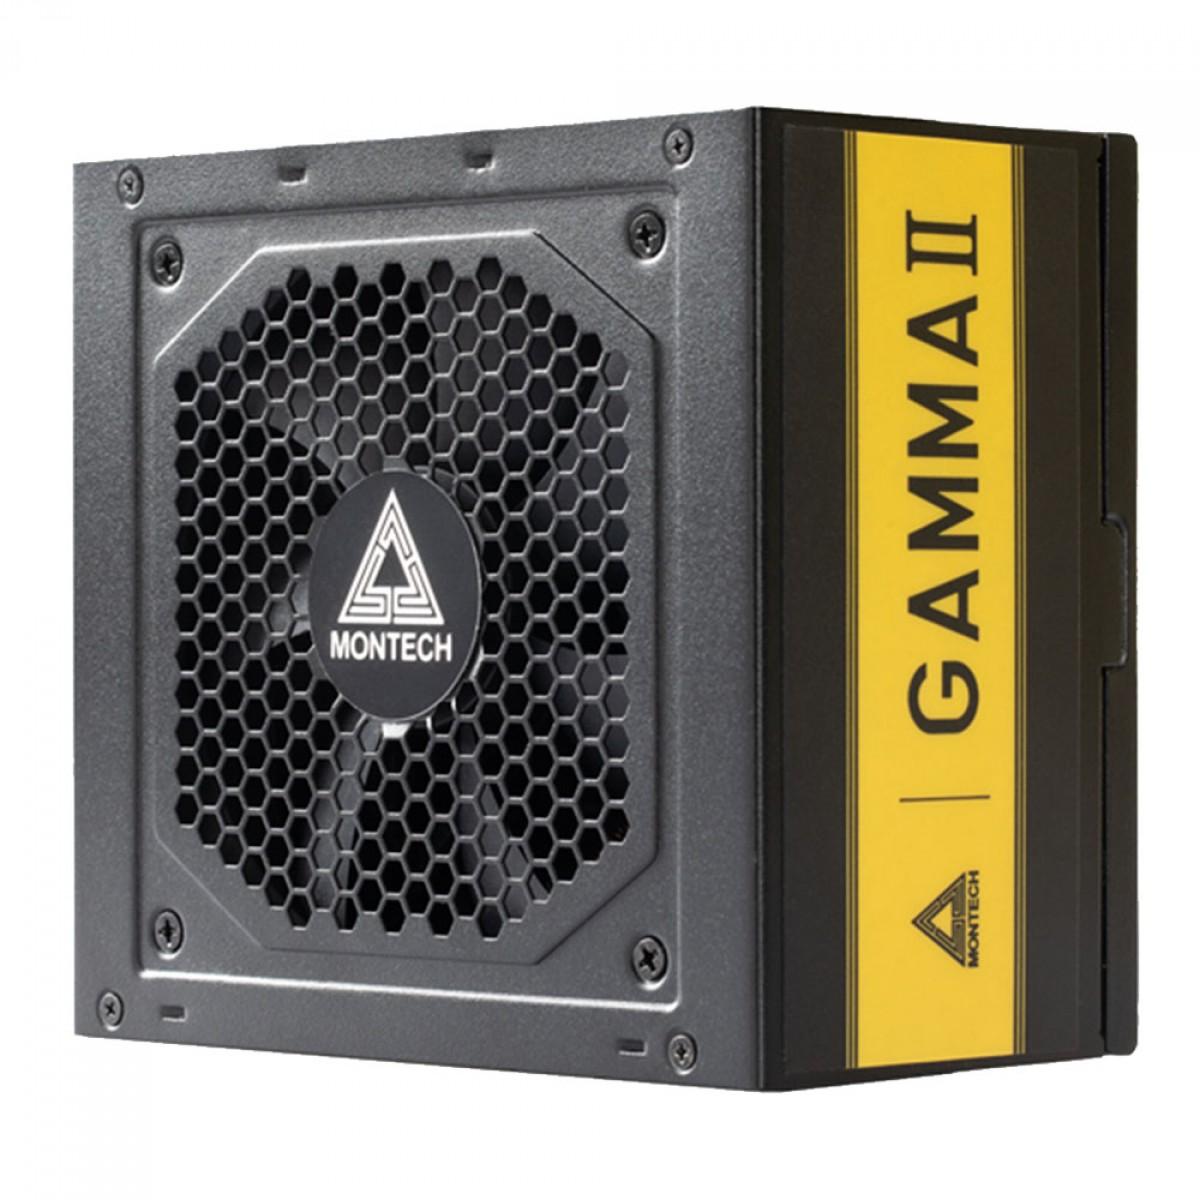 Fonte Montech GAMMA II Gold 550W, 80 Plus Gold, PFC Ativo